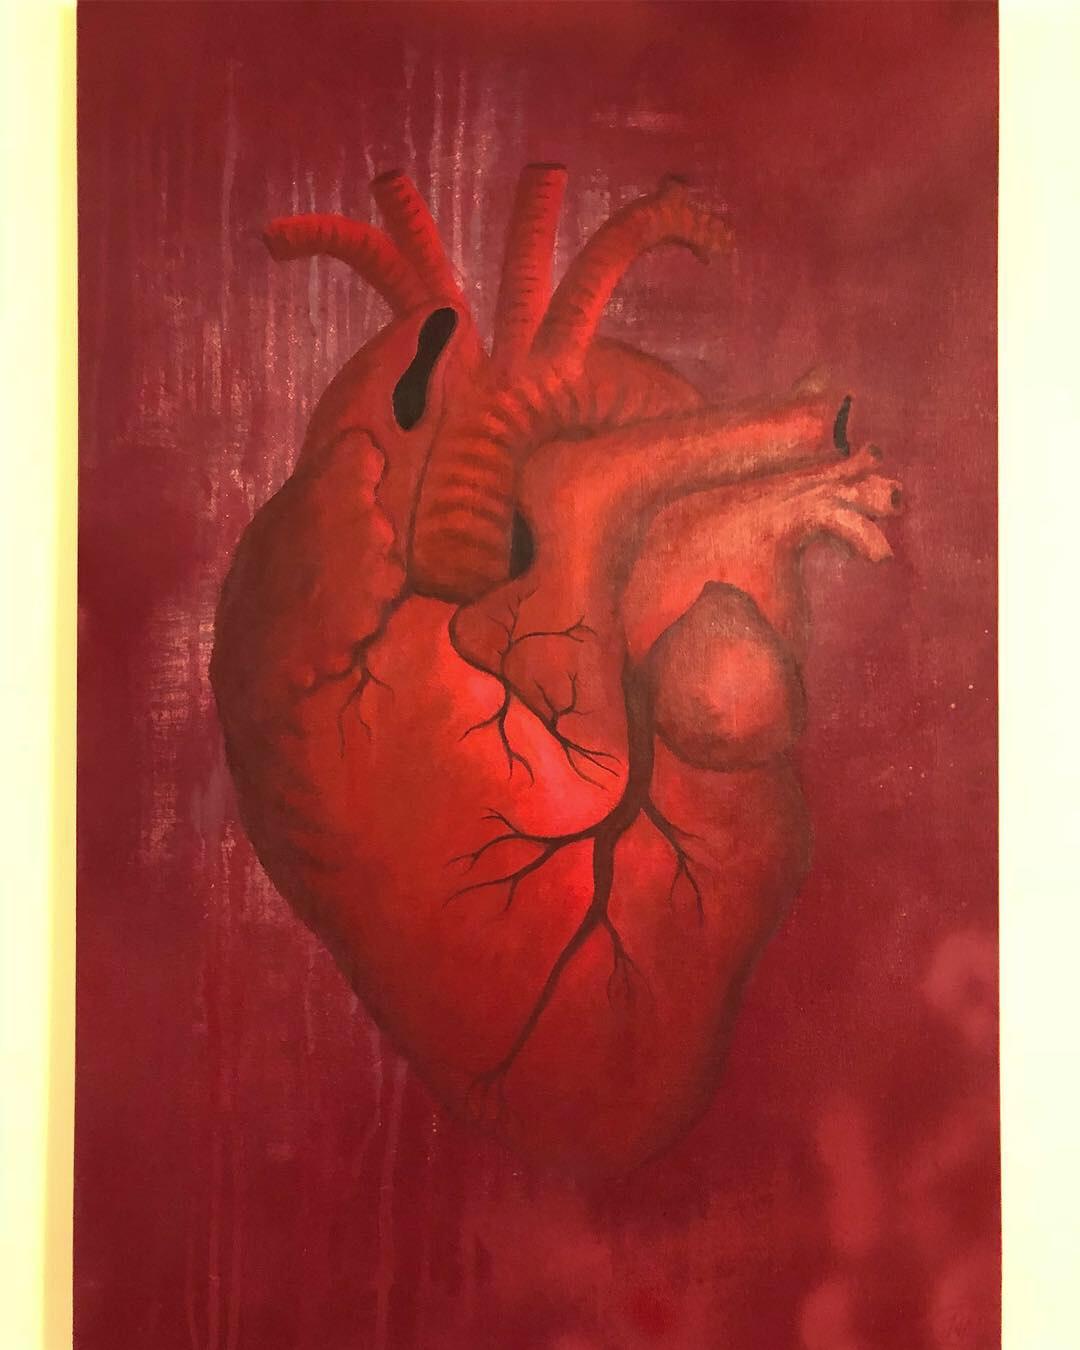 Aye Heart (Commission)